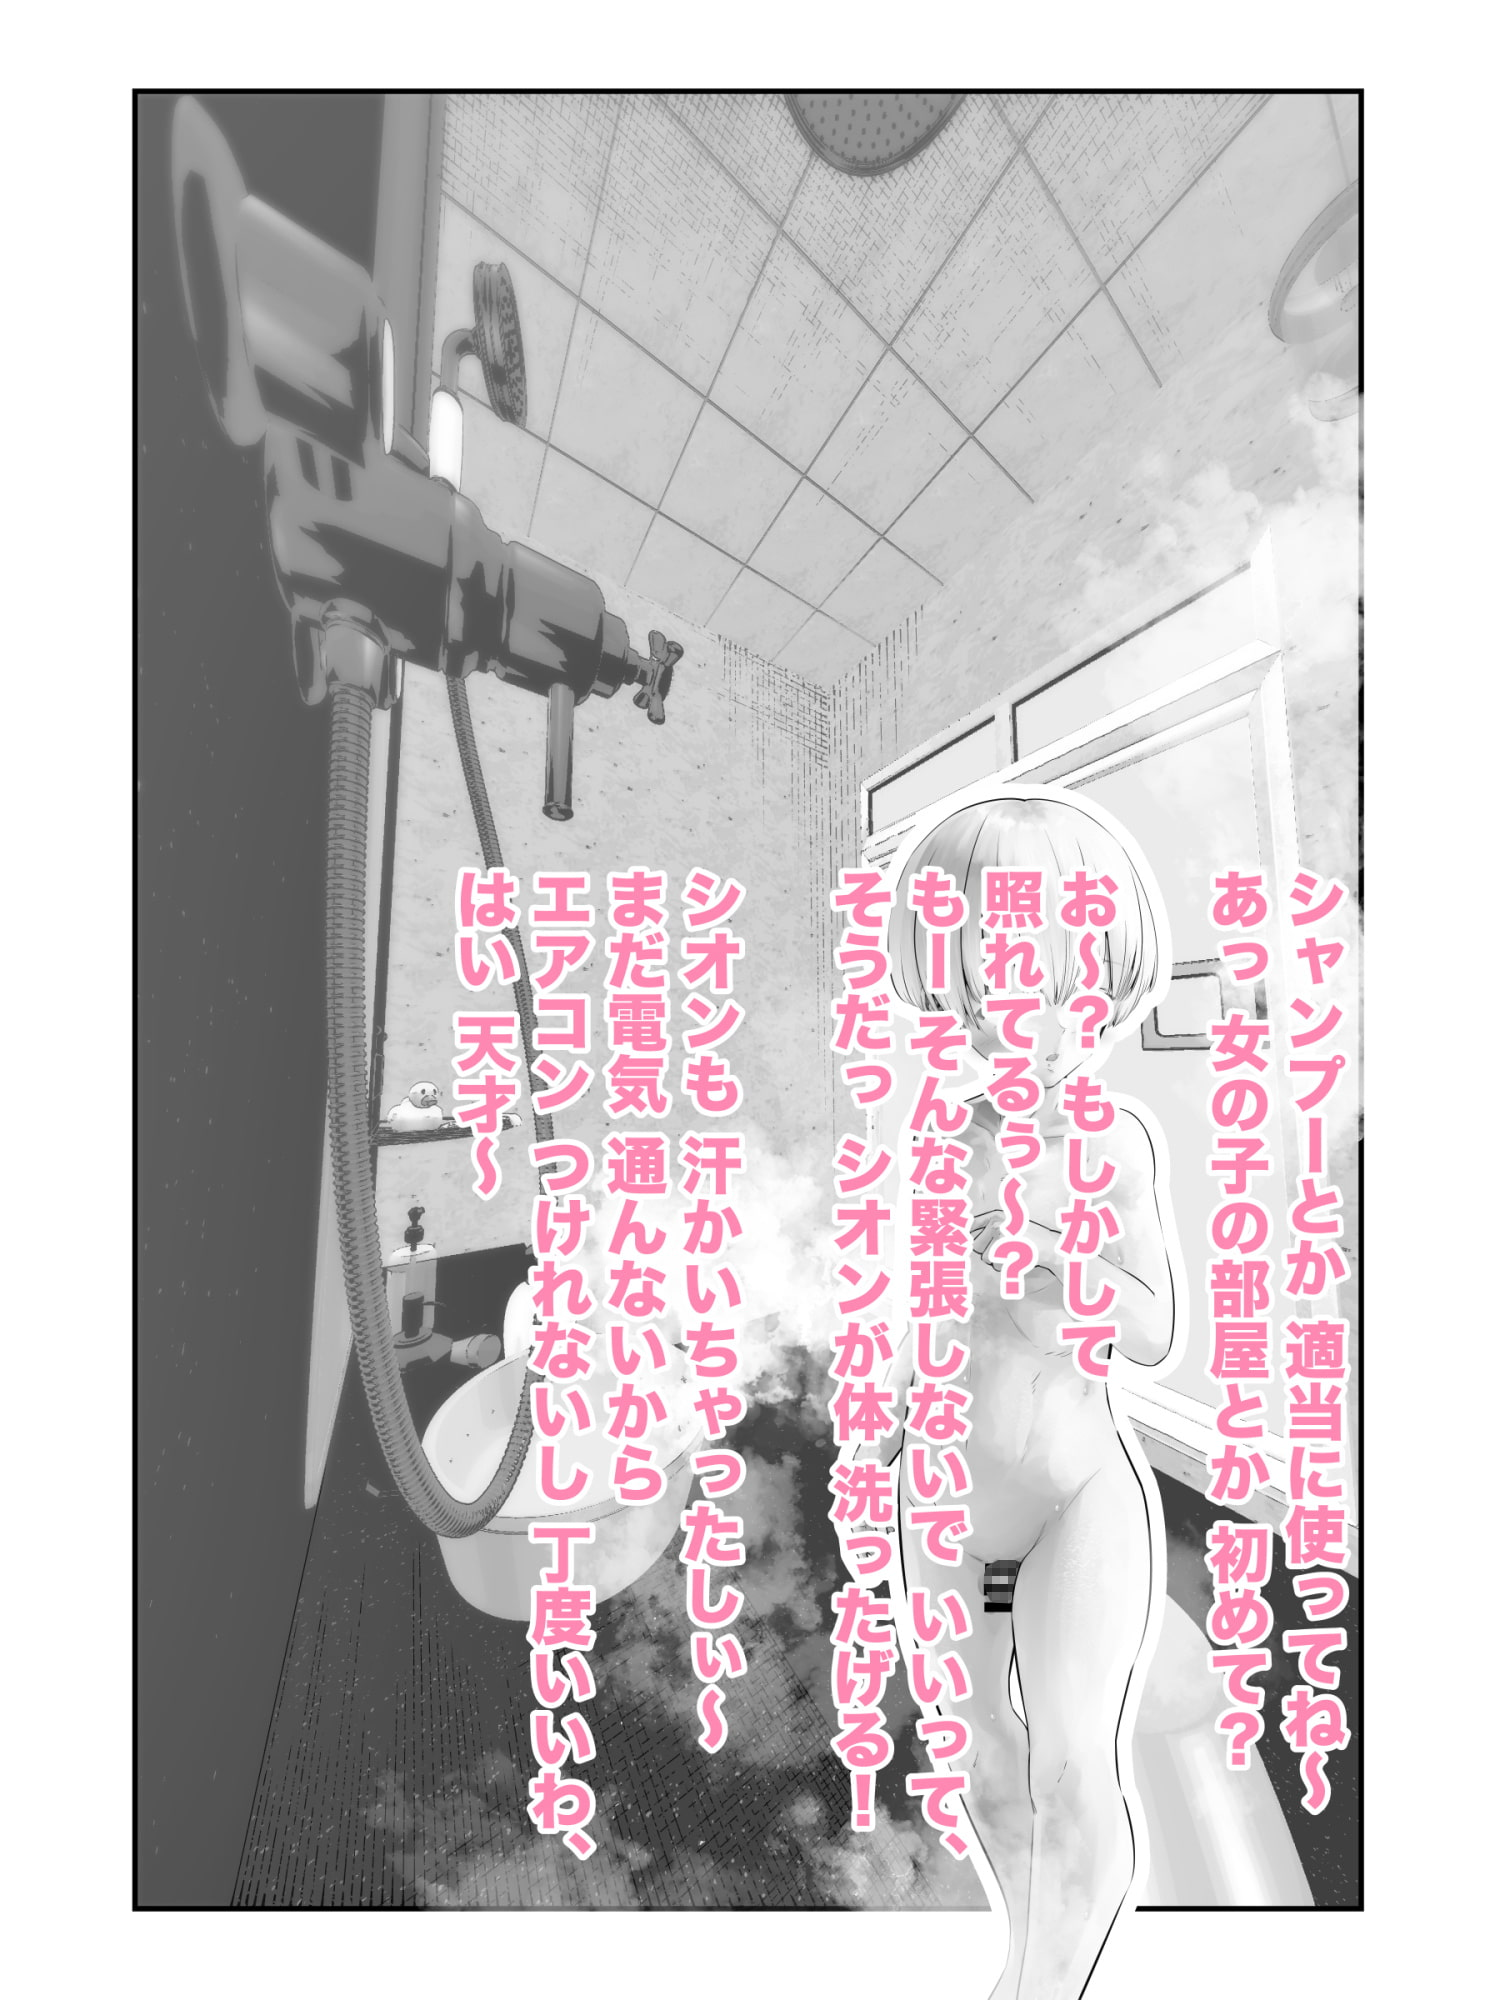 They Say You Can Become an Ecchi Oneesan if You Use the Kusogaki Move on a Shota